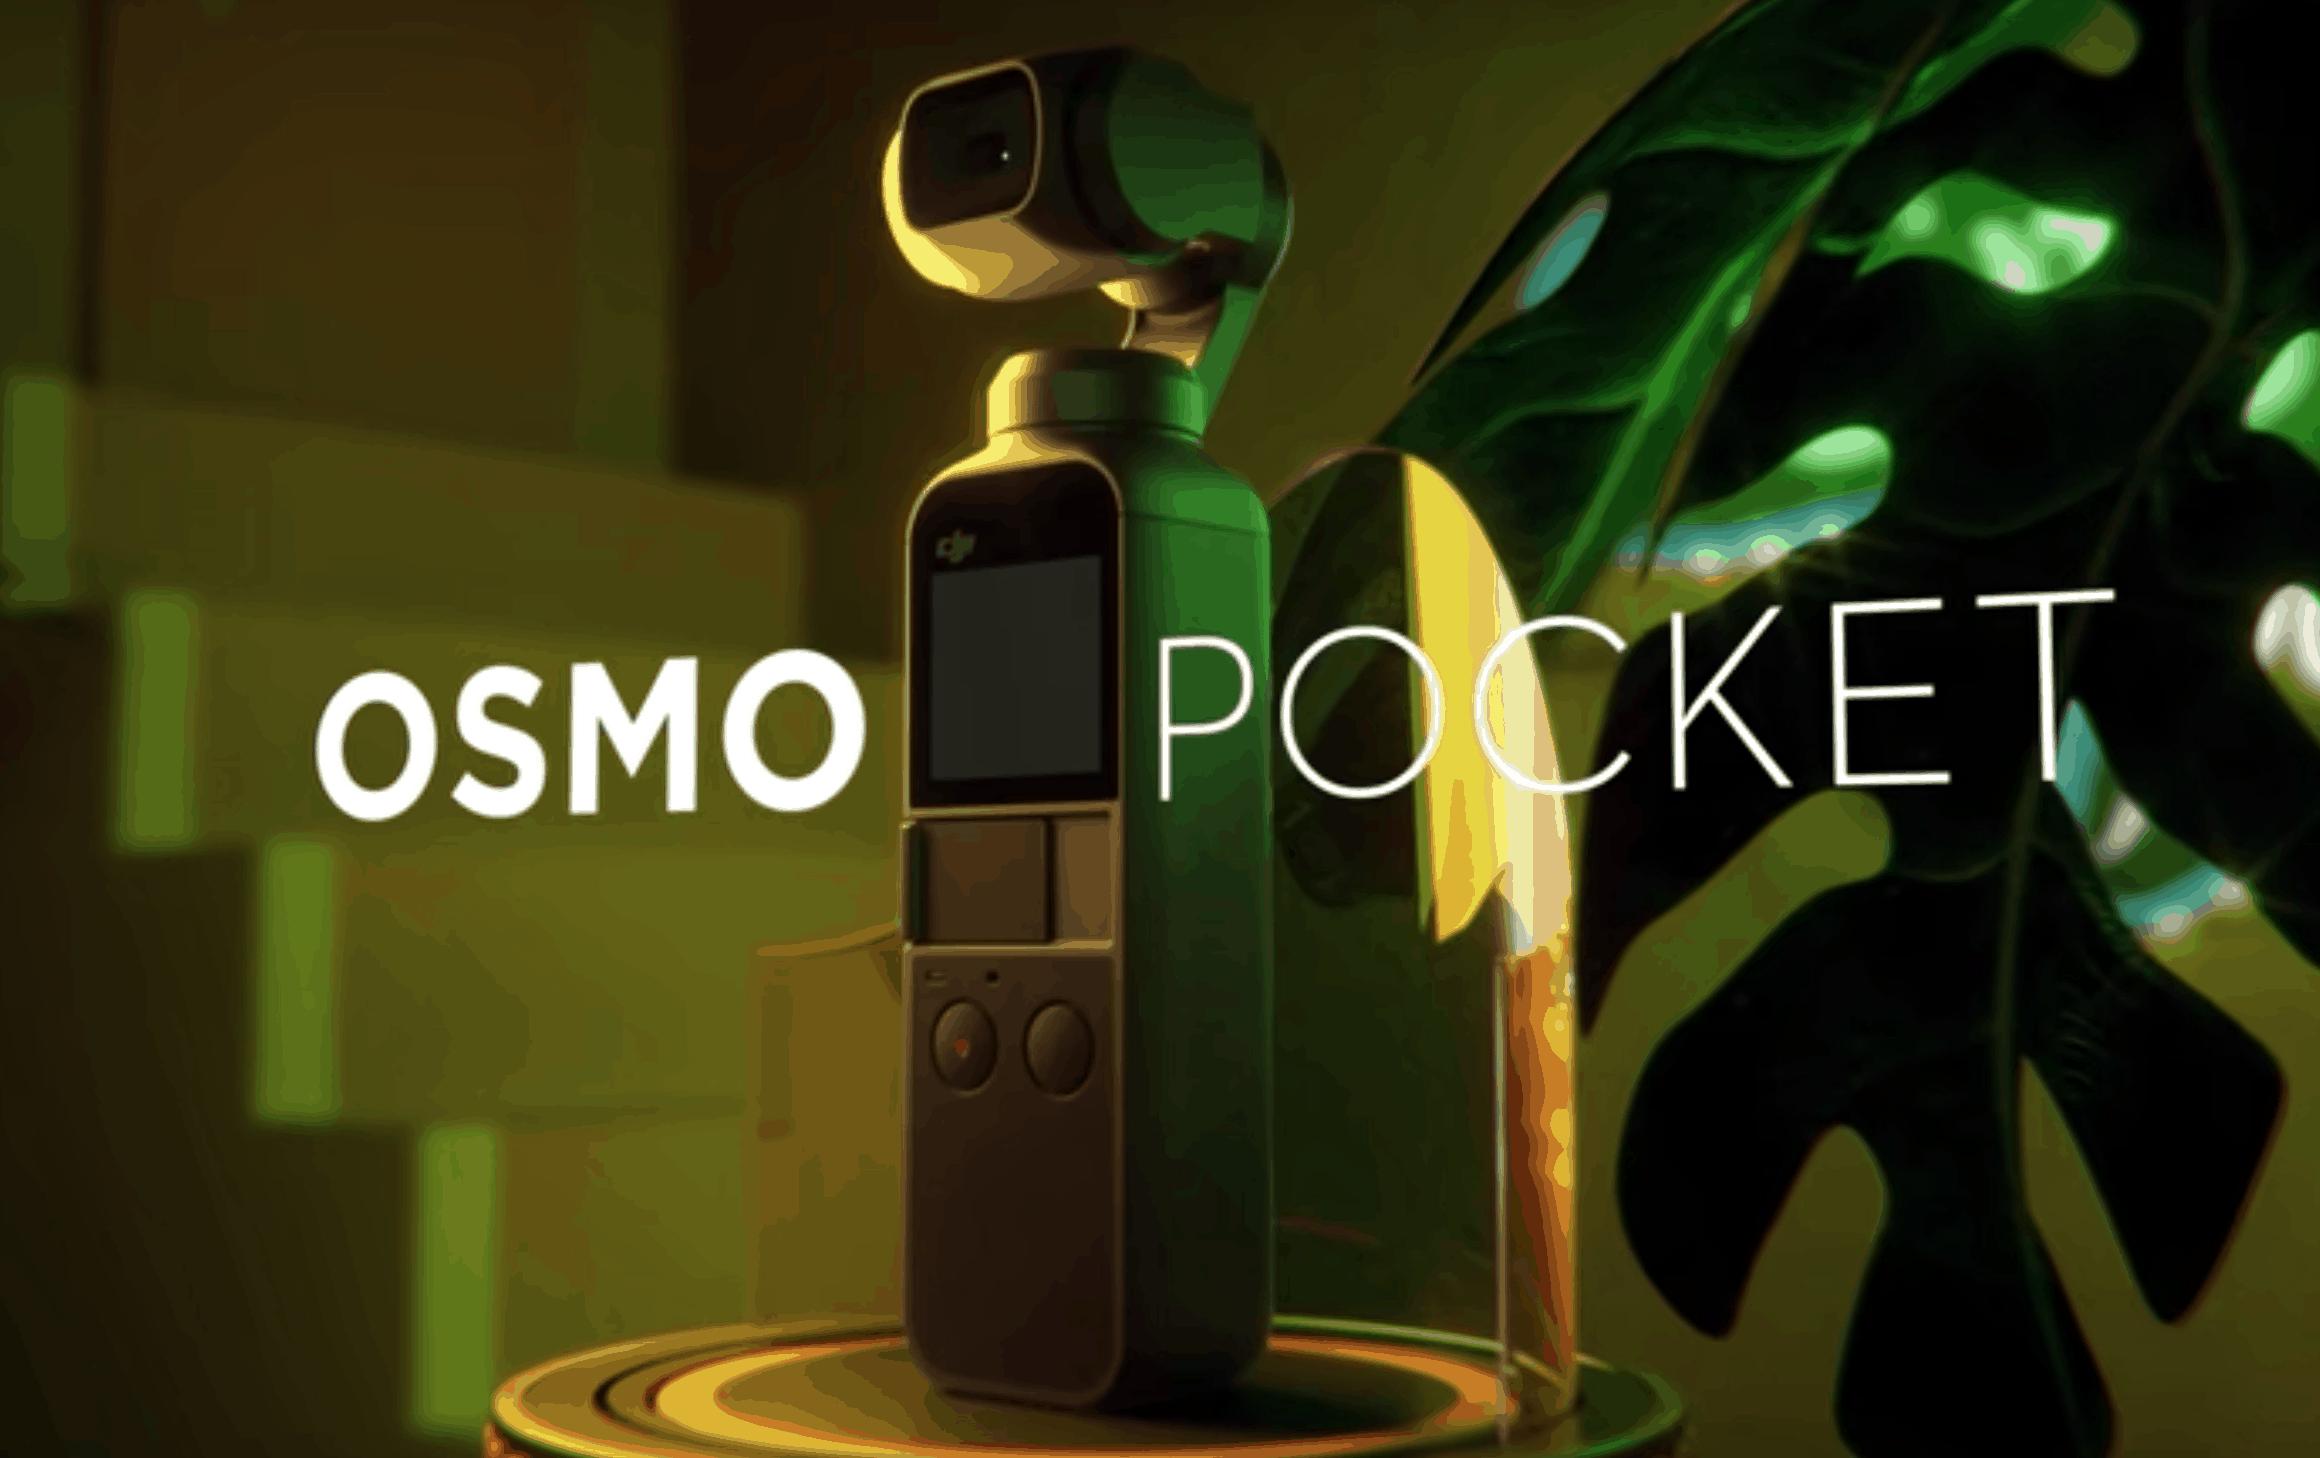 DJI Osmo Pocket Handheld 3-Axis Gimbal with 4K action Camera